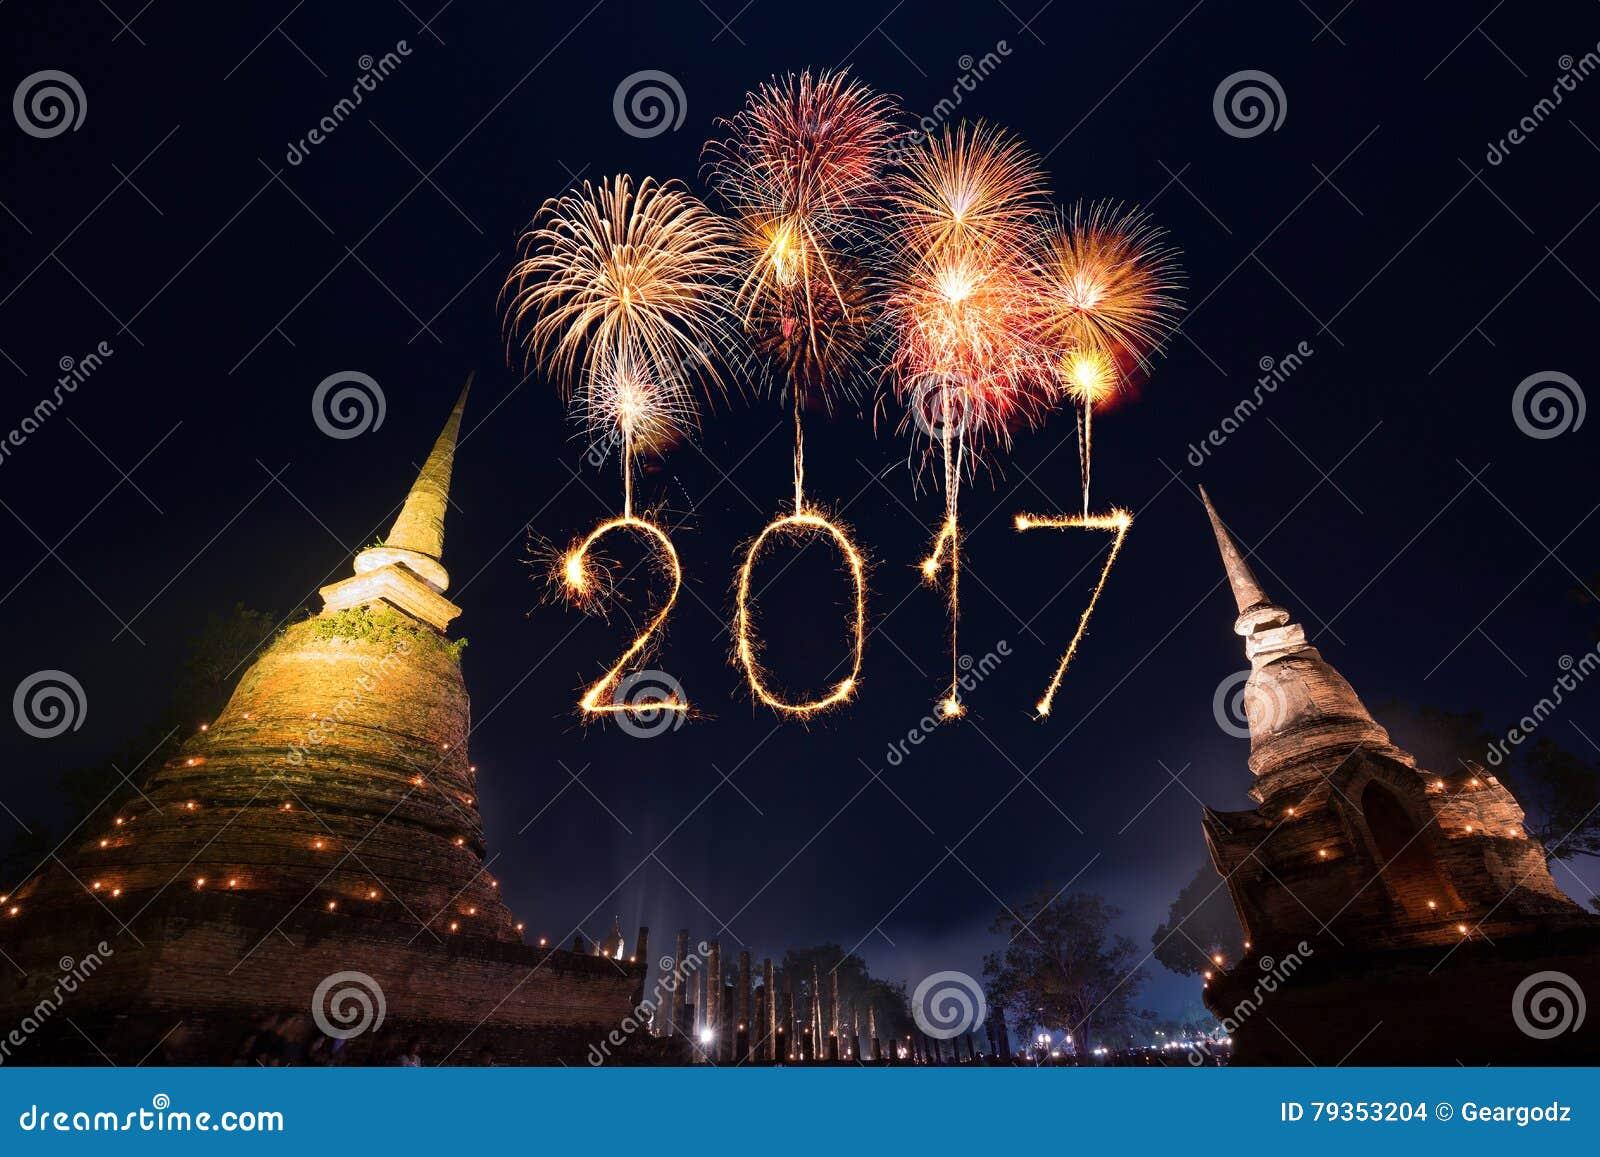 2017 happy new year fireworks celebrating over sukhothai historical park thailand